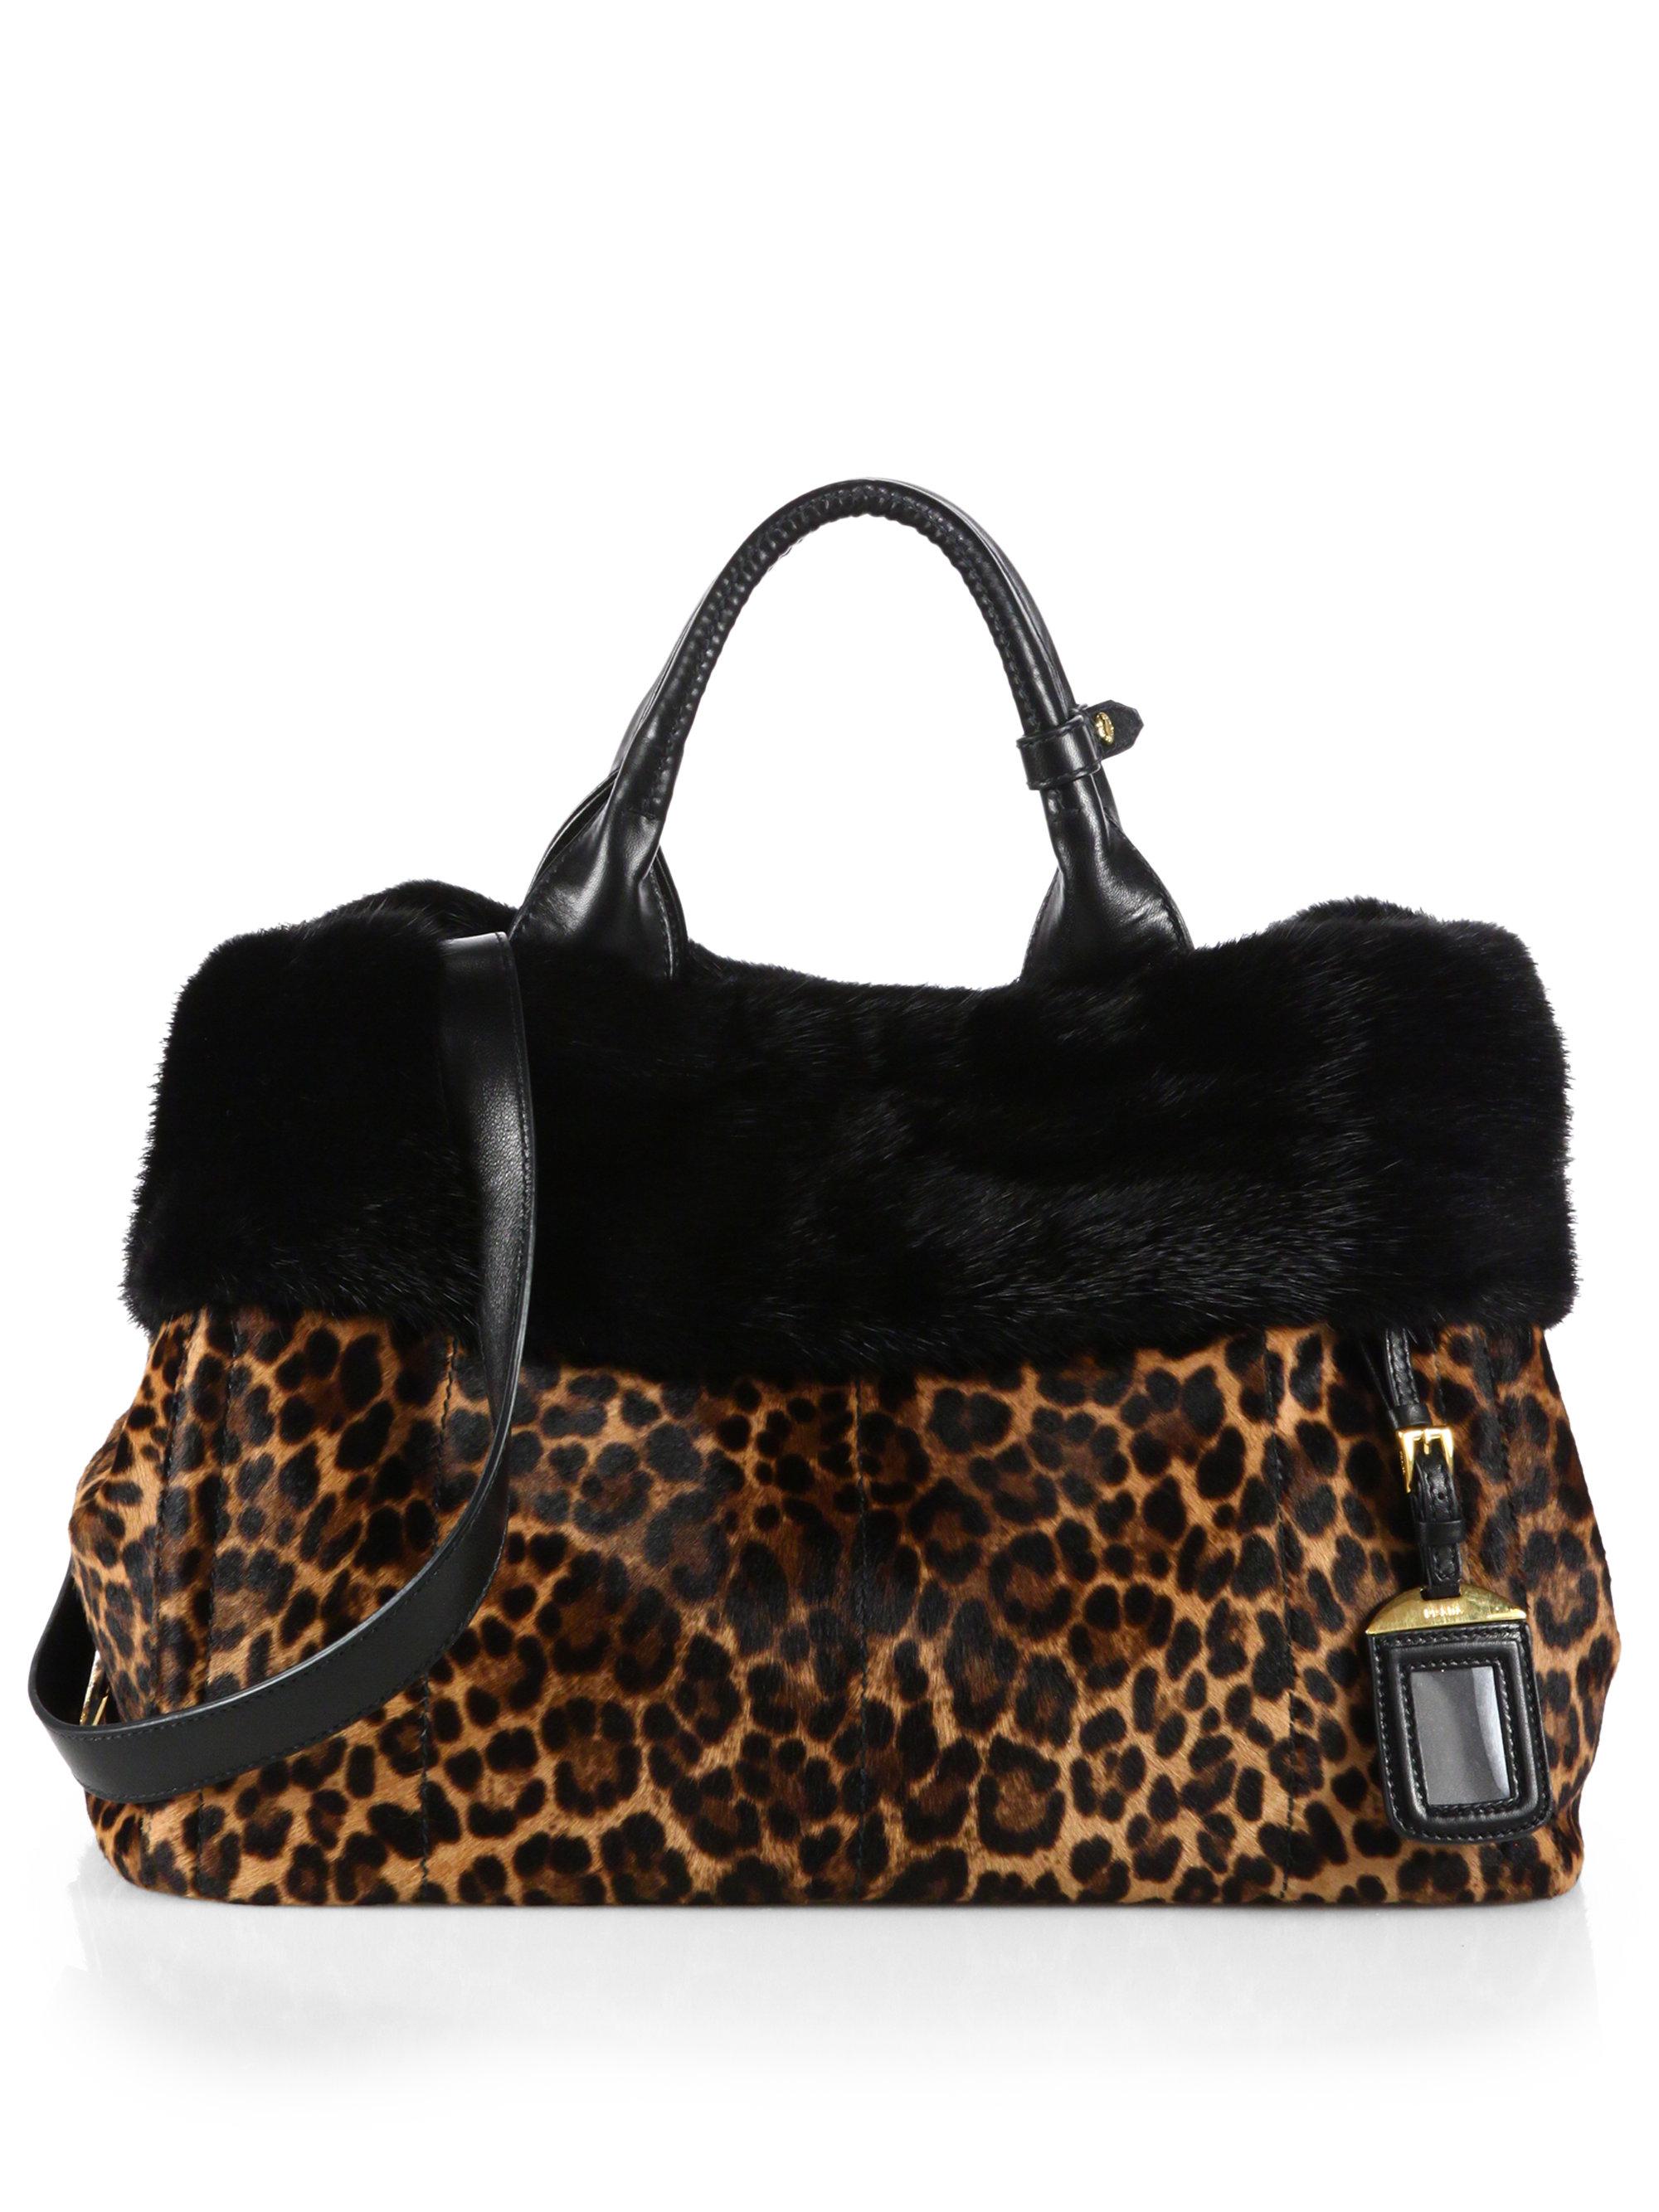 Prada Cavallino \u0026amp; Mink Fur Garden Bag in Animal (LEOPARD) | Lyst